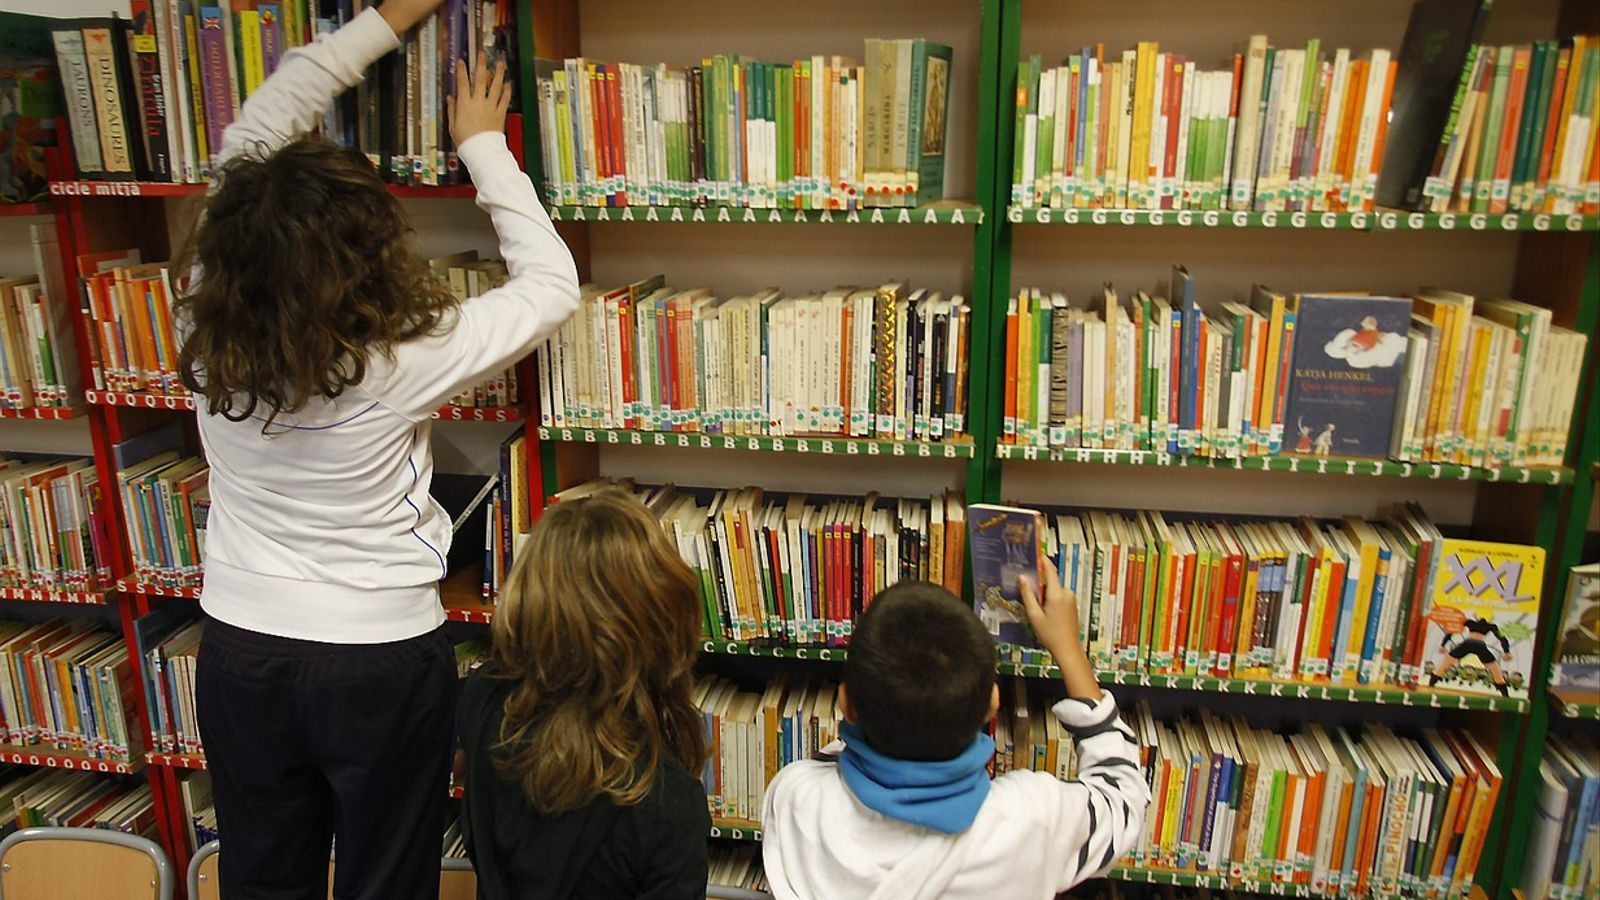 DES DE CASA - Página 12 Tres-nens-biblioteca-escolar_1721238014_36477168_651x366